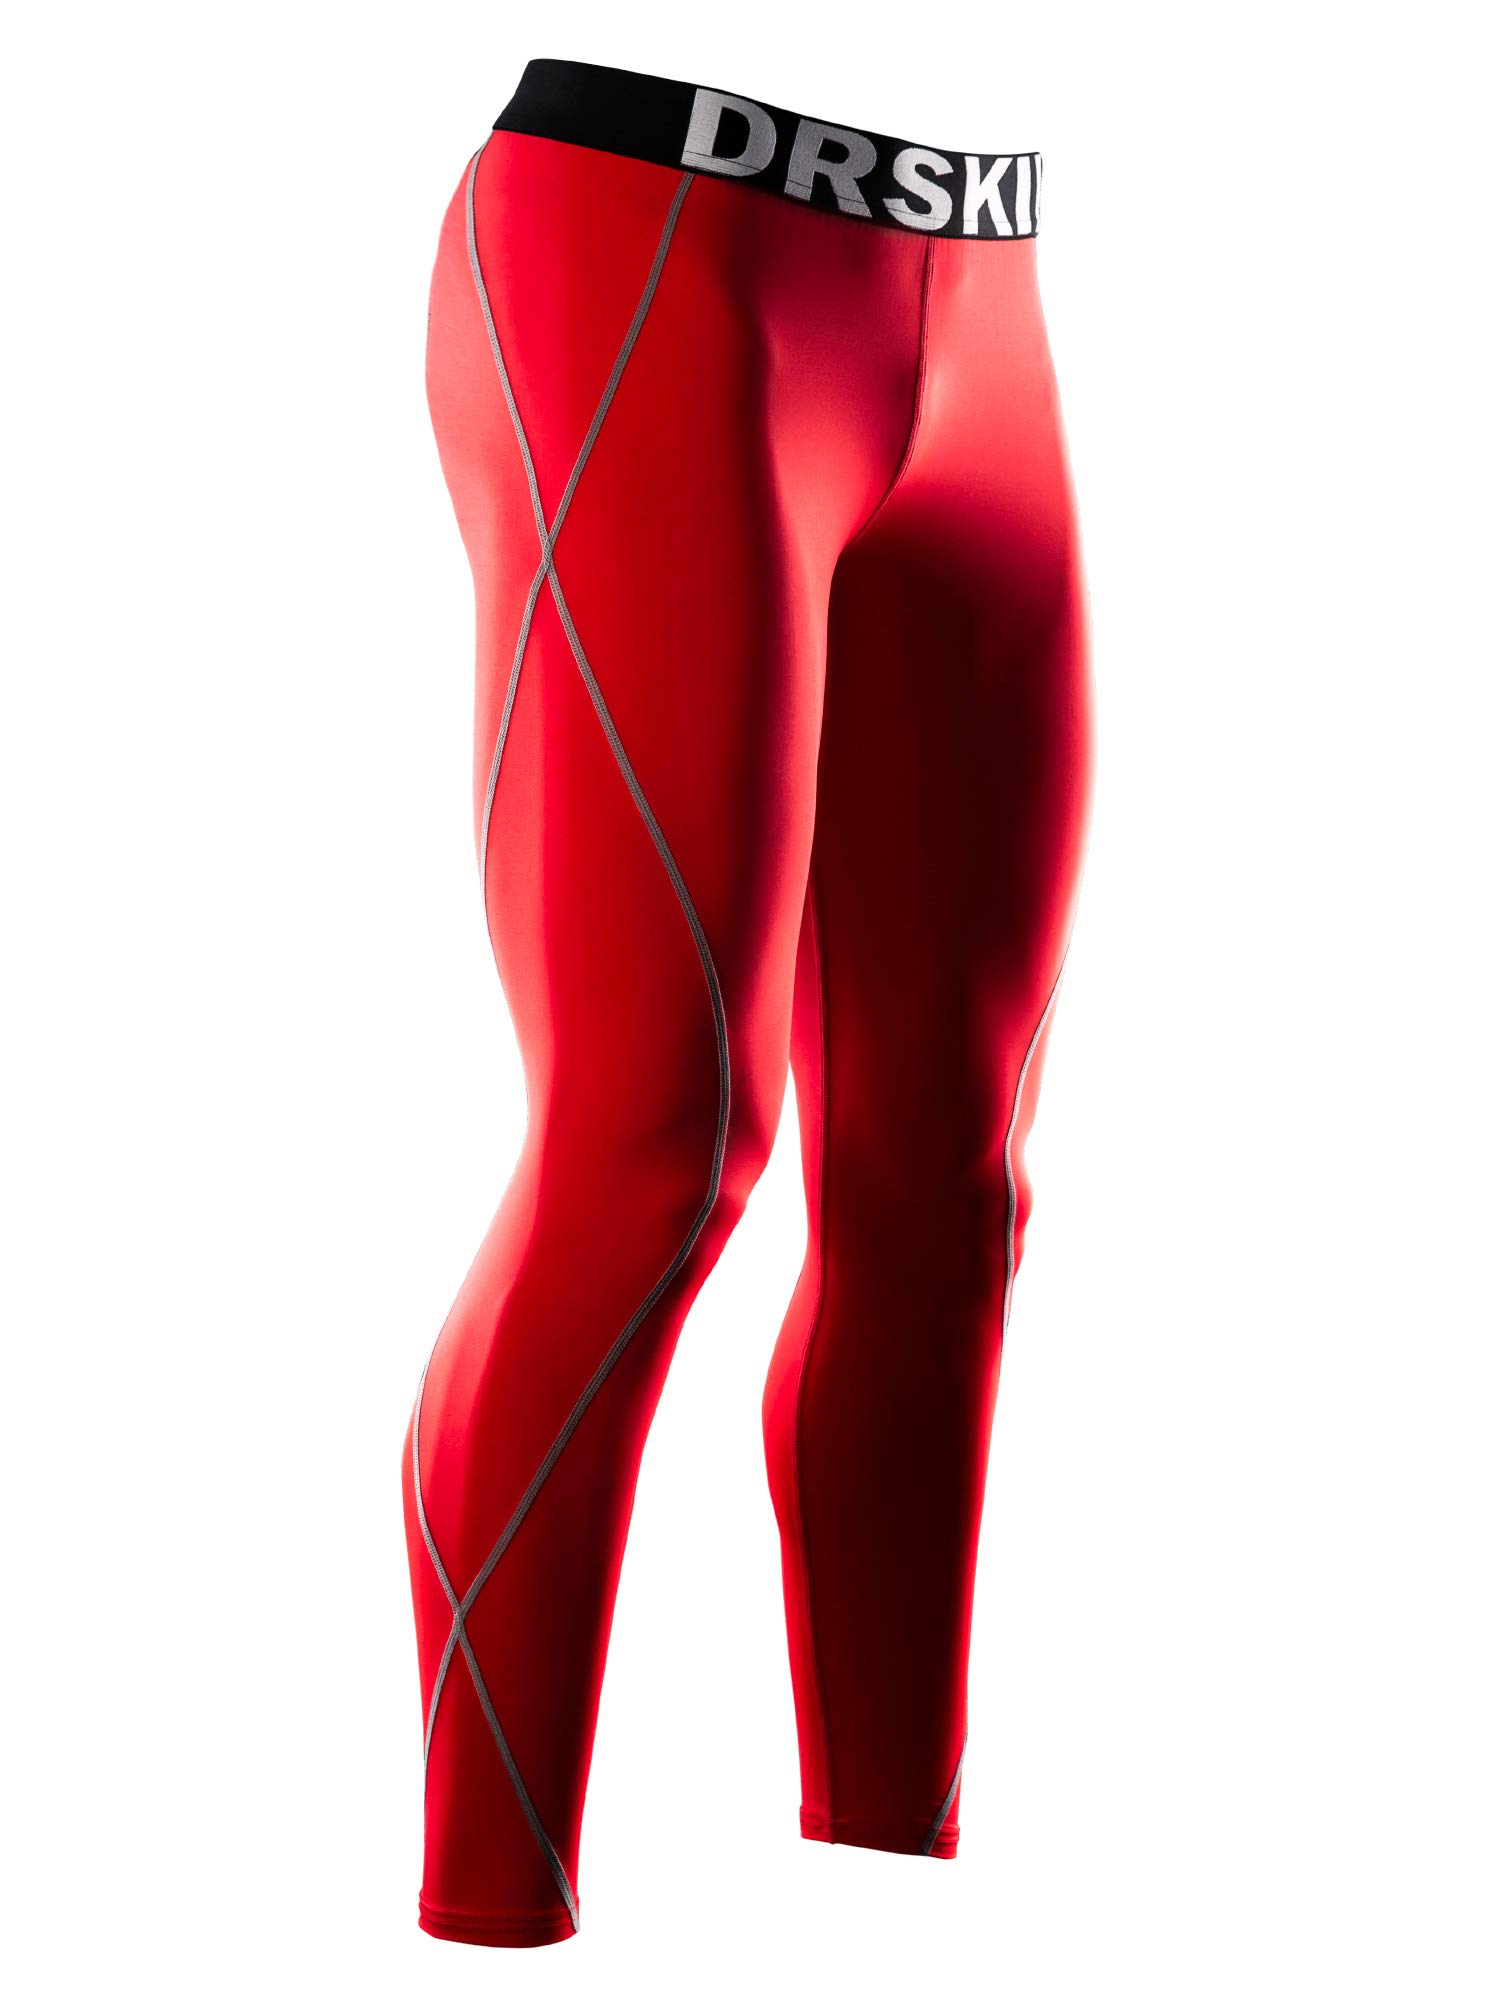 DRSKIN Compression Cool Dry Sports Tights Pants Baselayer Running Leggings Yoga Rashguard Men (DRG167, 4S)